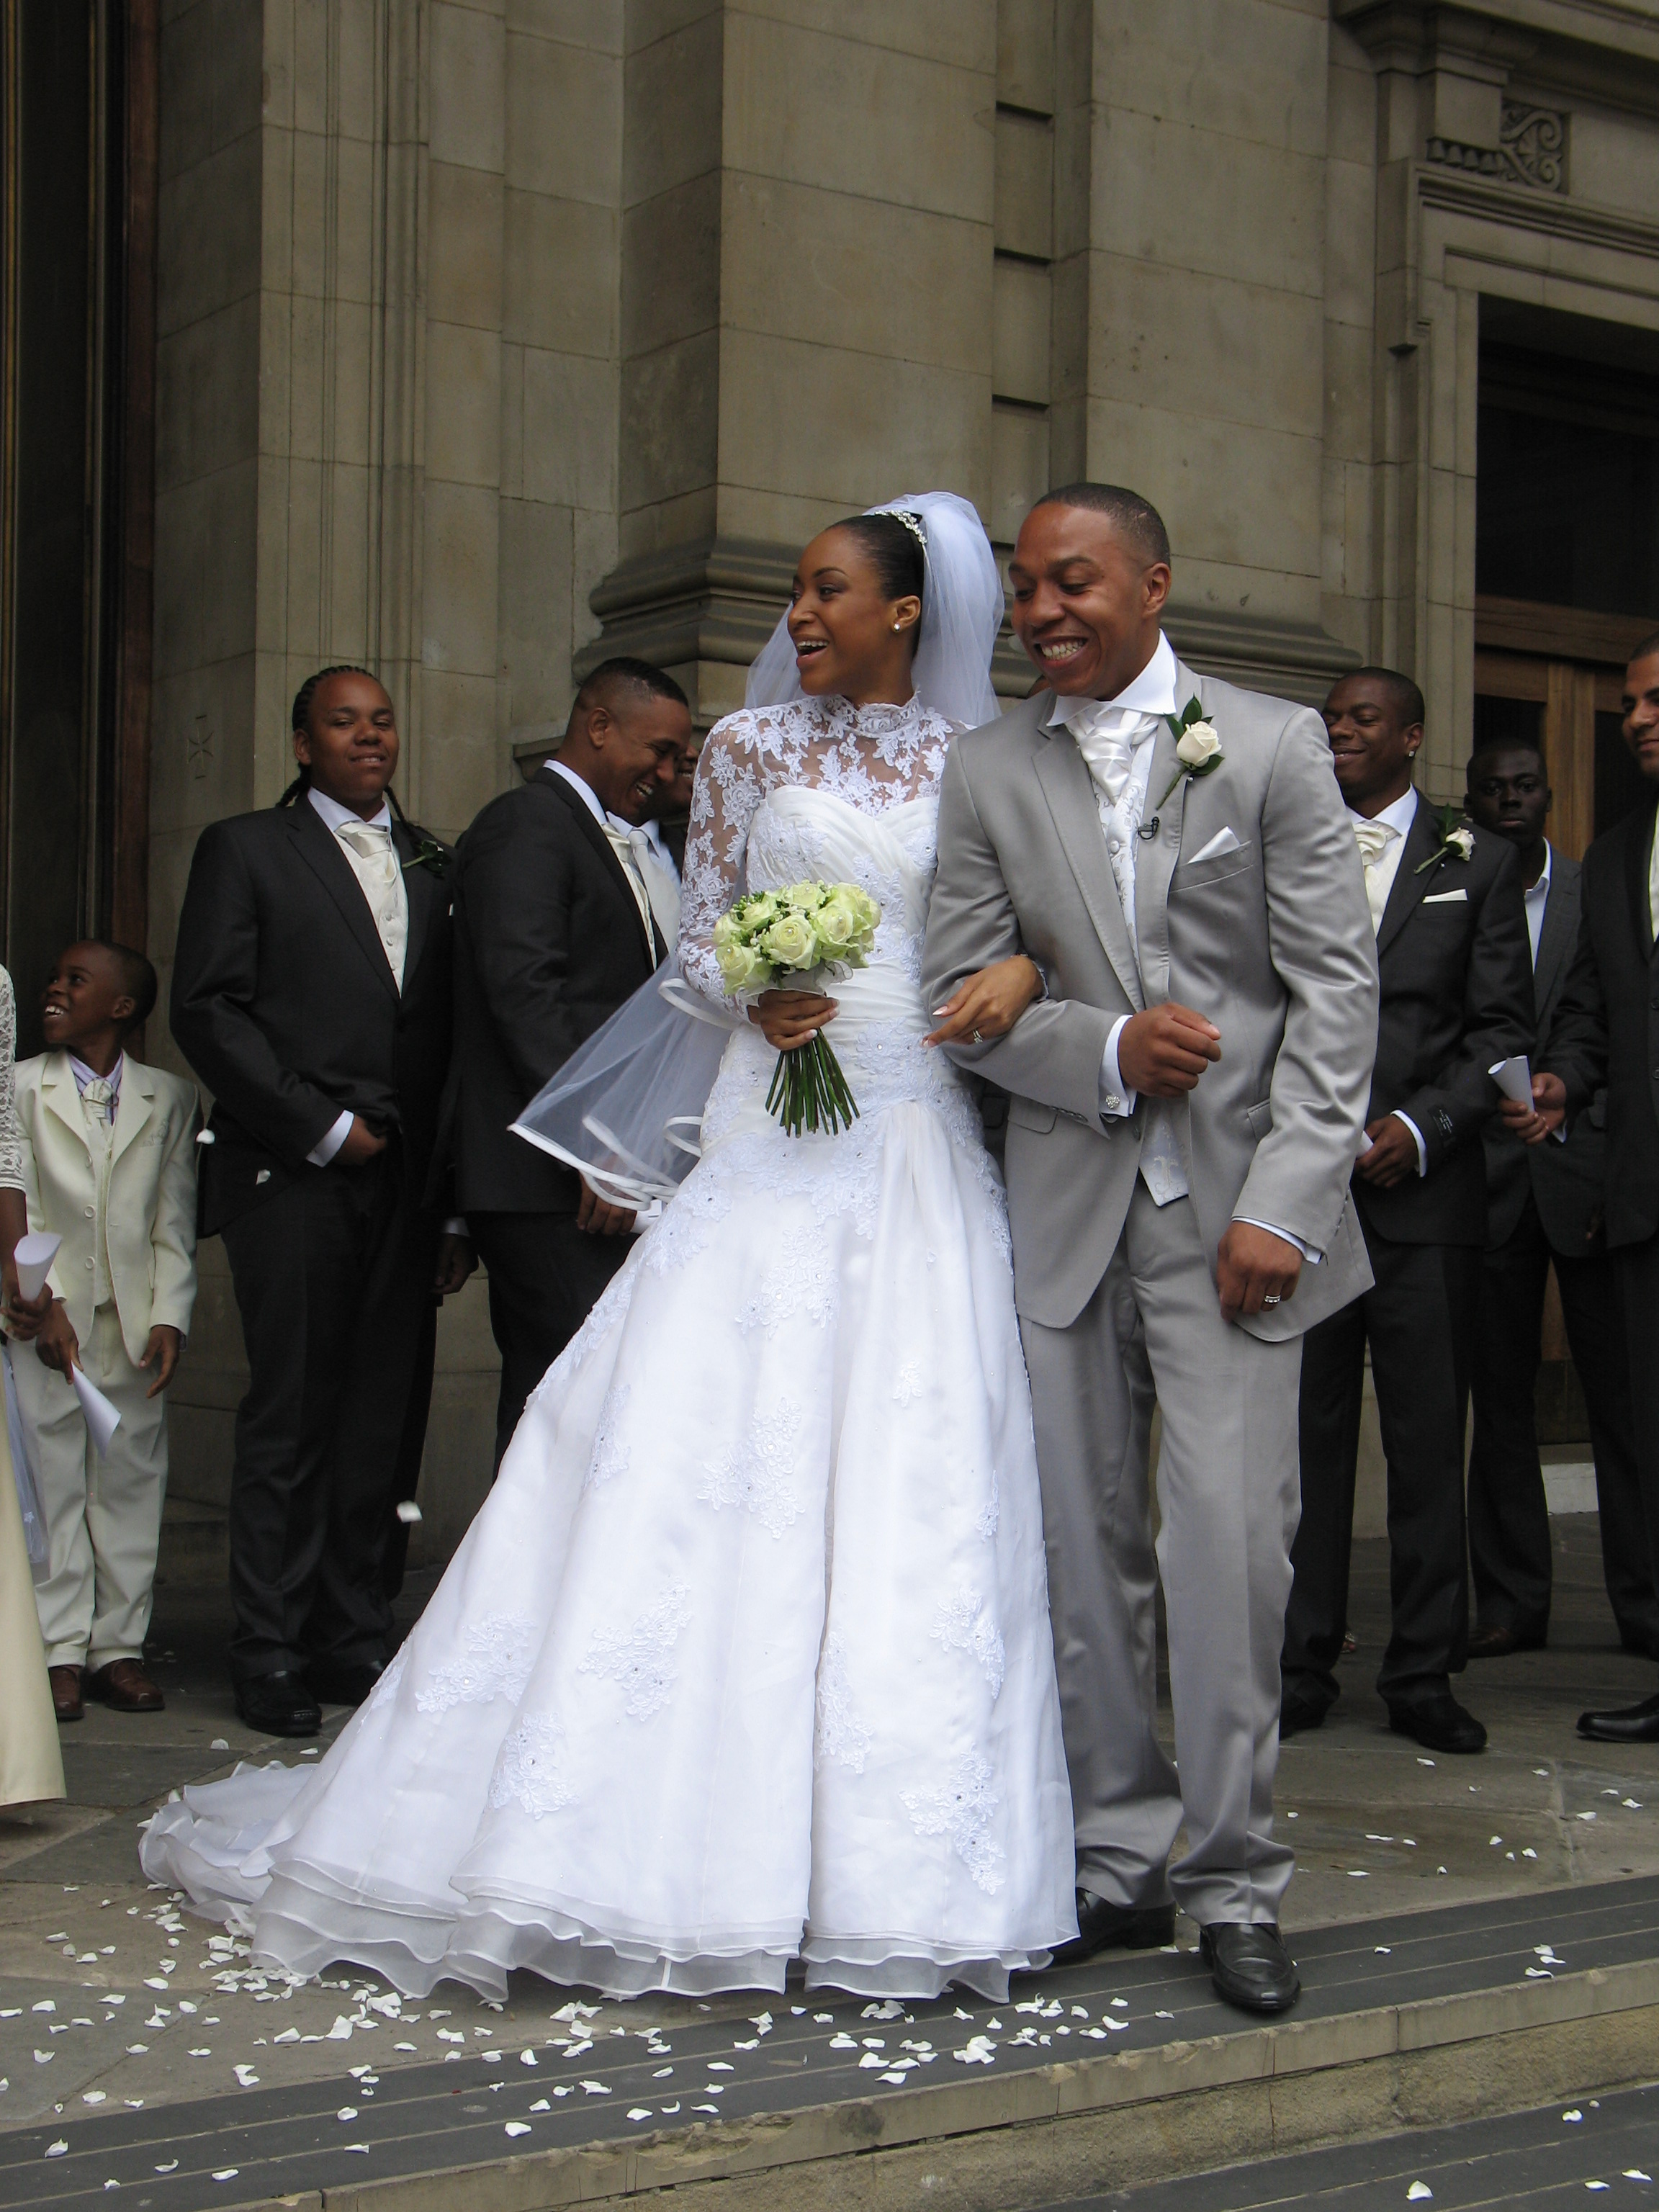 Wedding Reception Decorations | Wedding Centerpieces | White Wedding ...